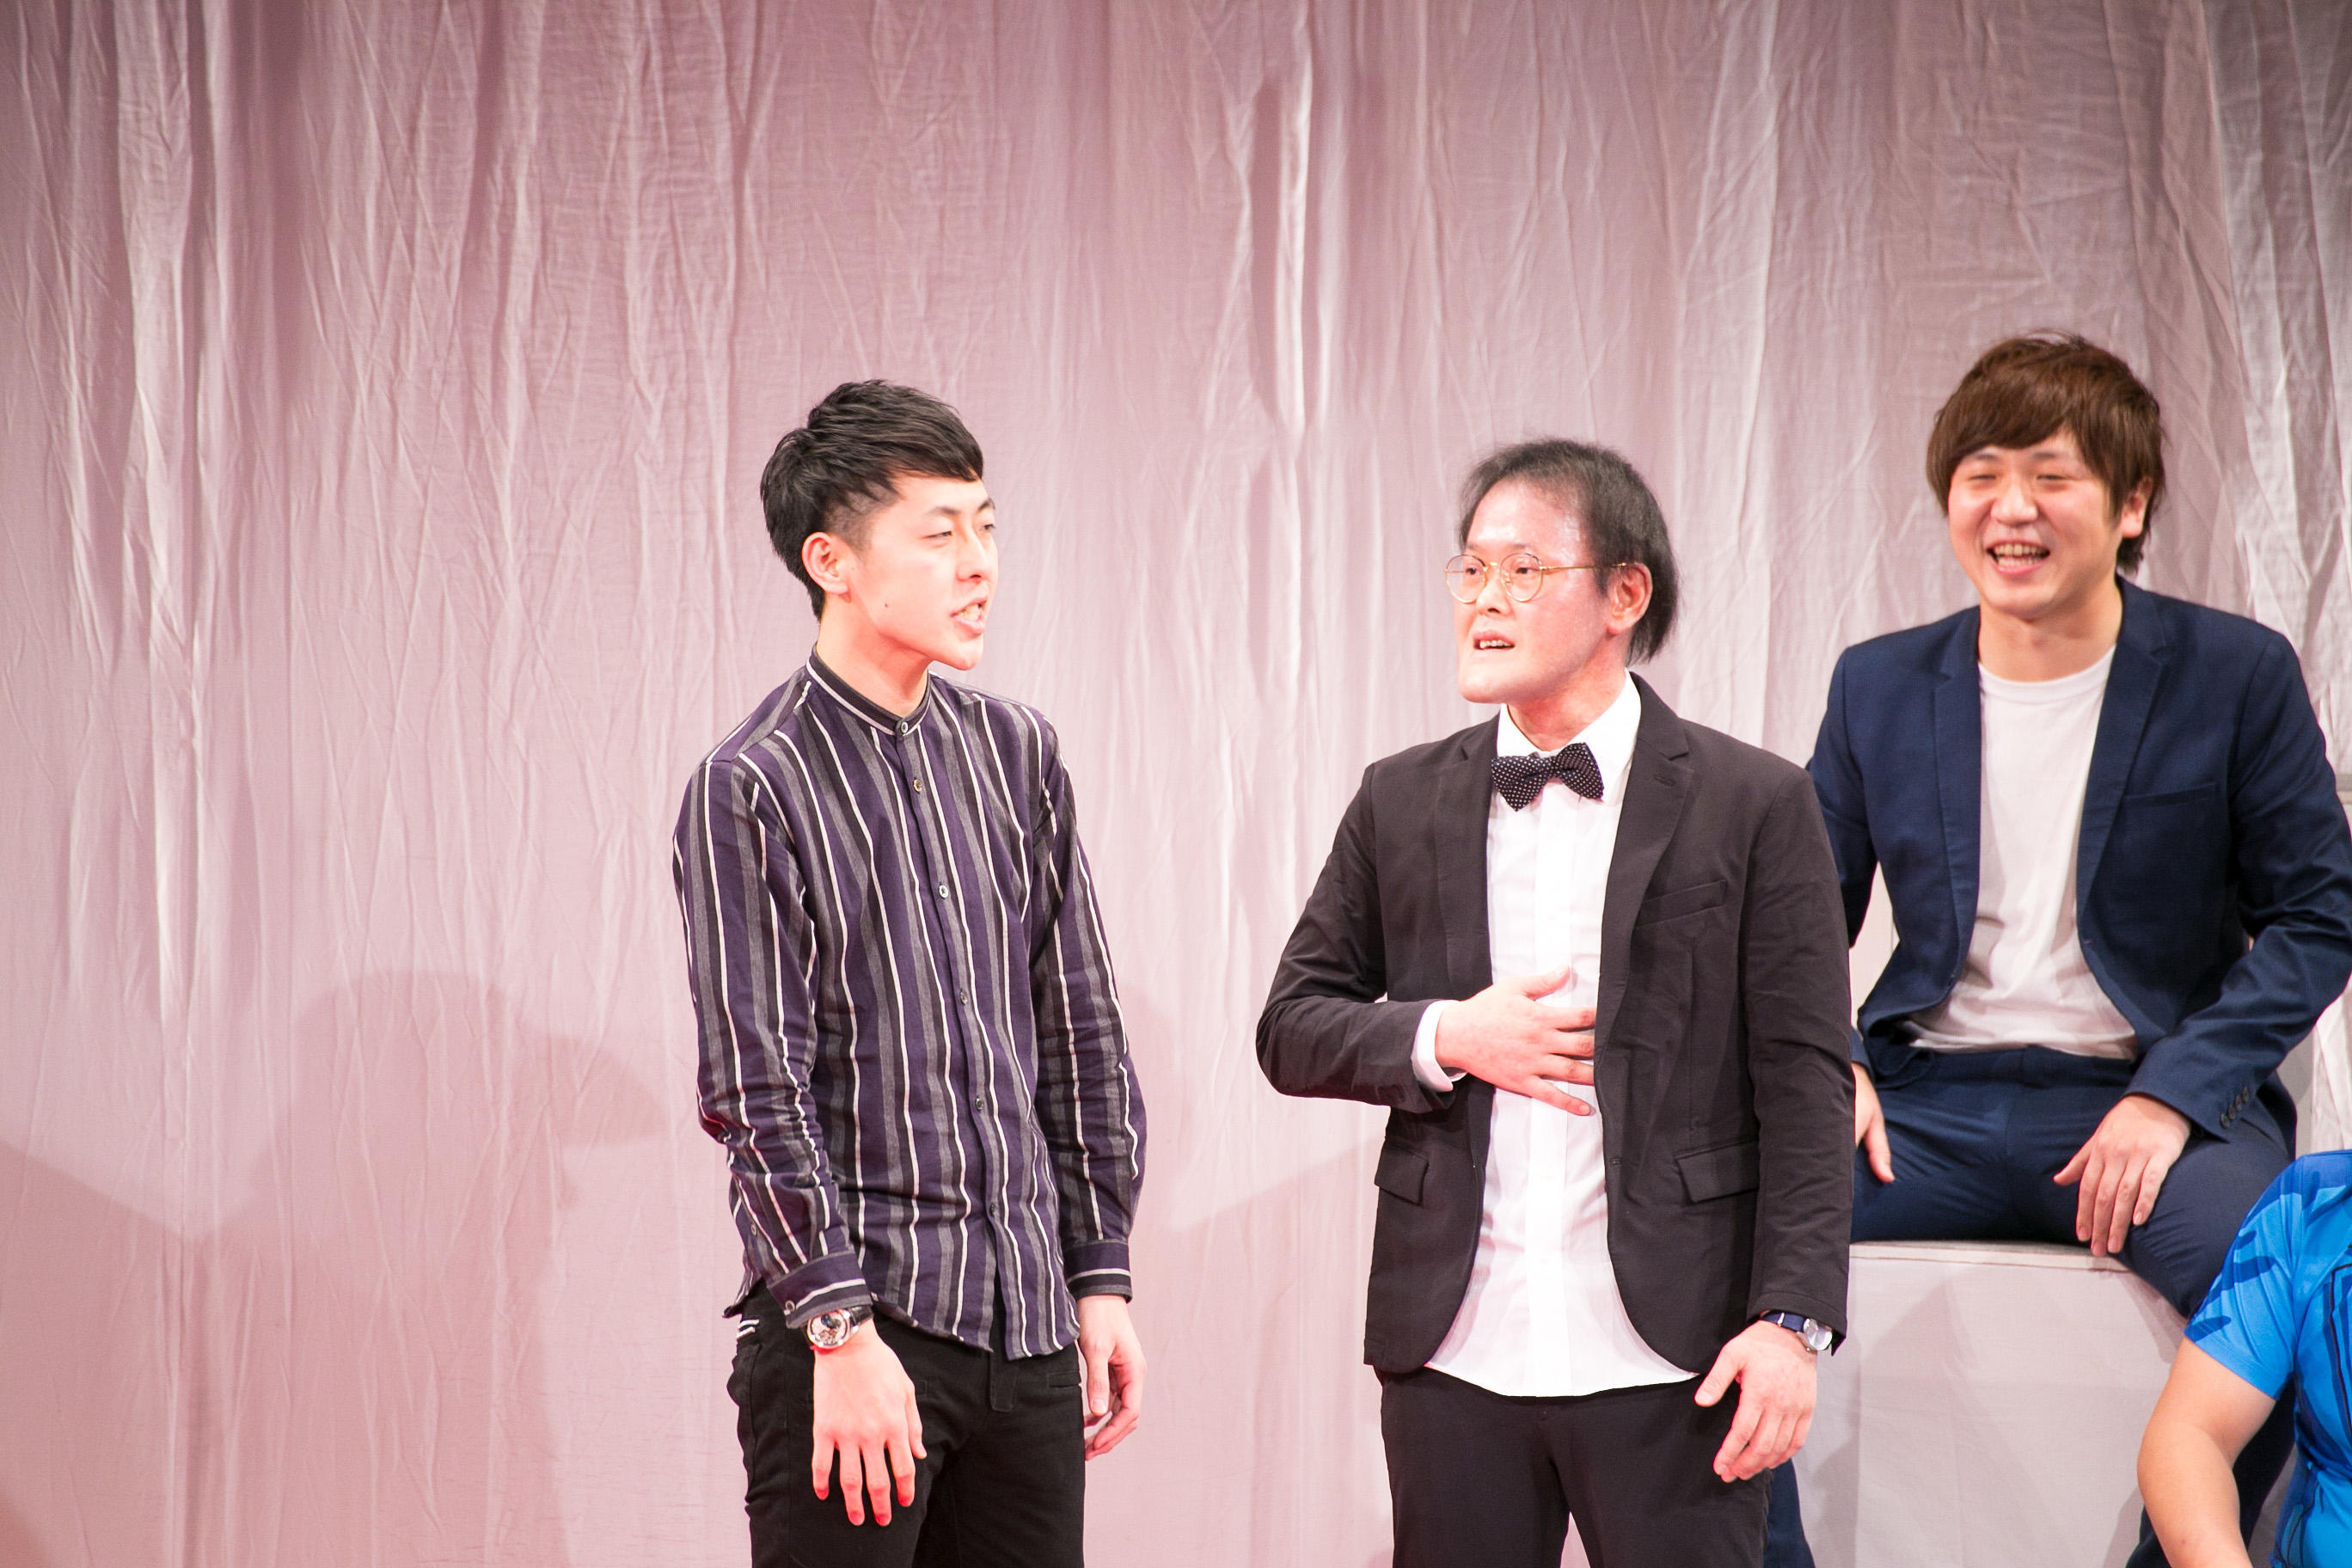 http://news.yoshimoto.co.jp/20181228111015-79385b78c520049ebbadeb749e744c981acb7131.jpg